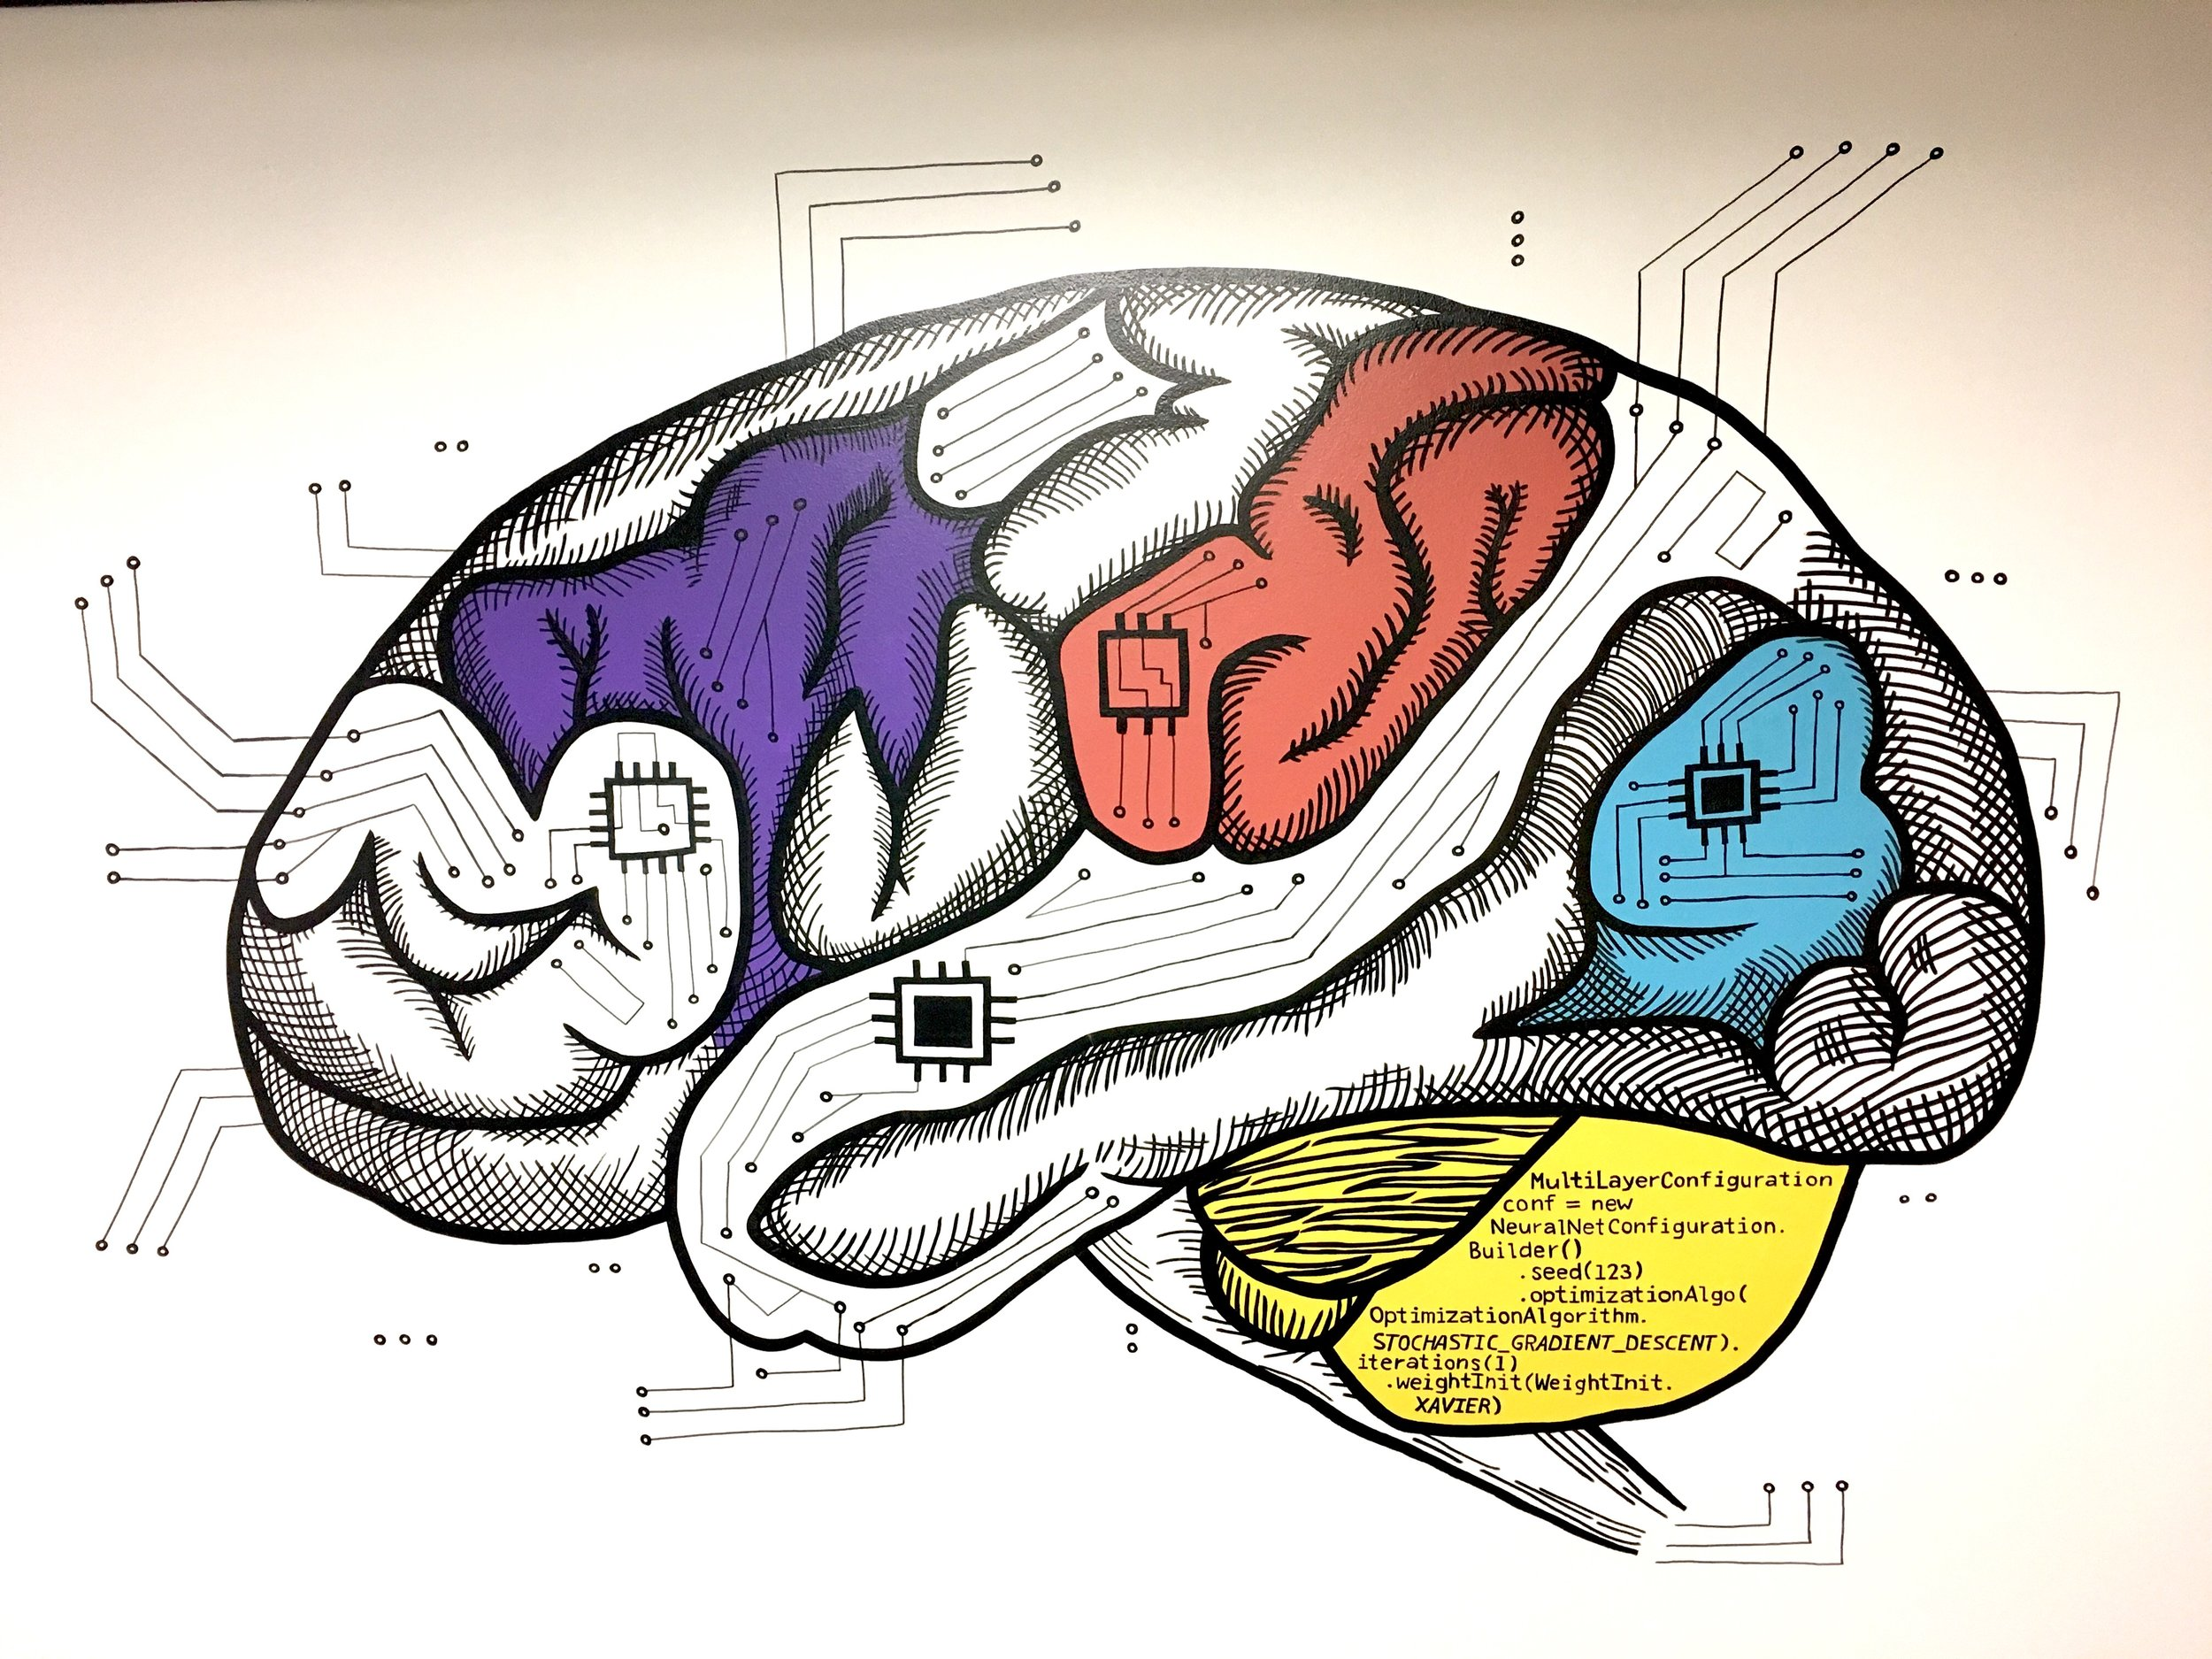 Iodine Software Office Mural, Austin